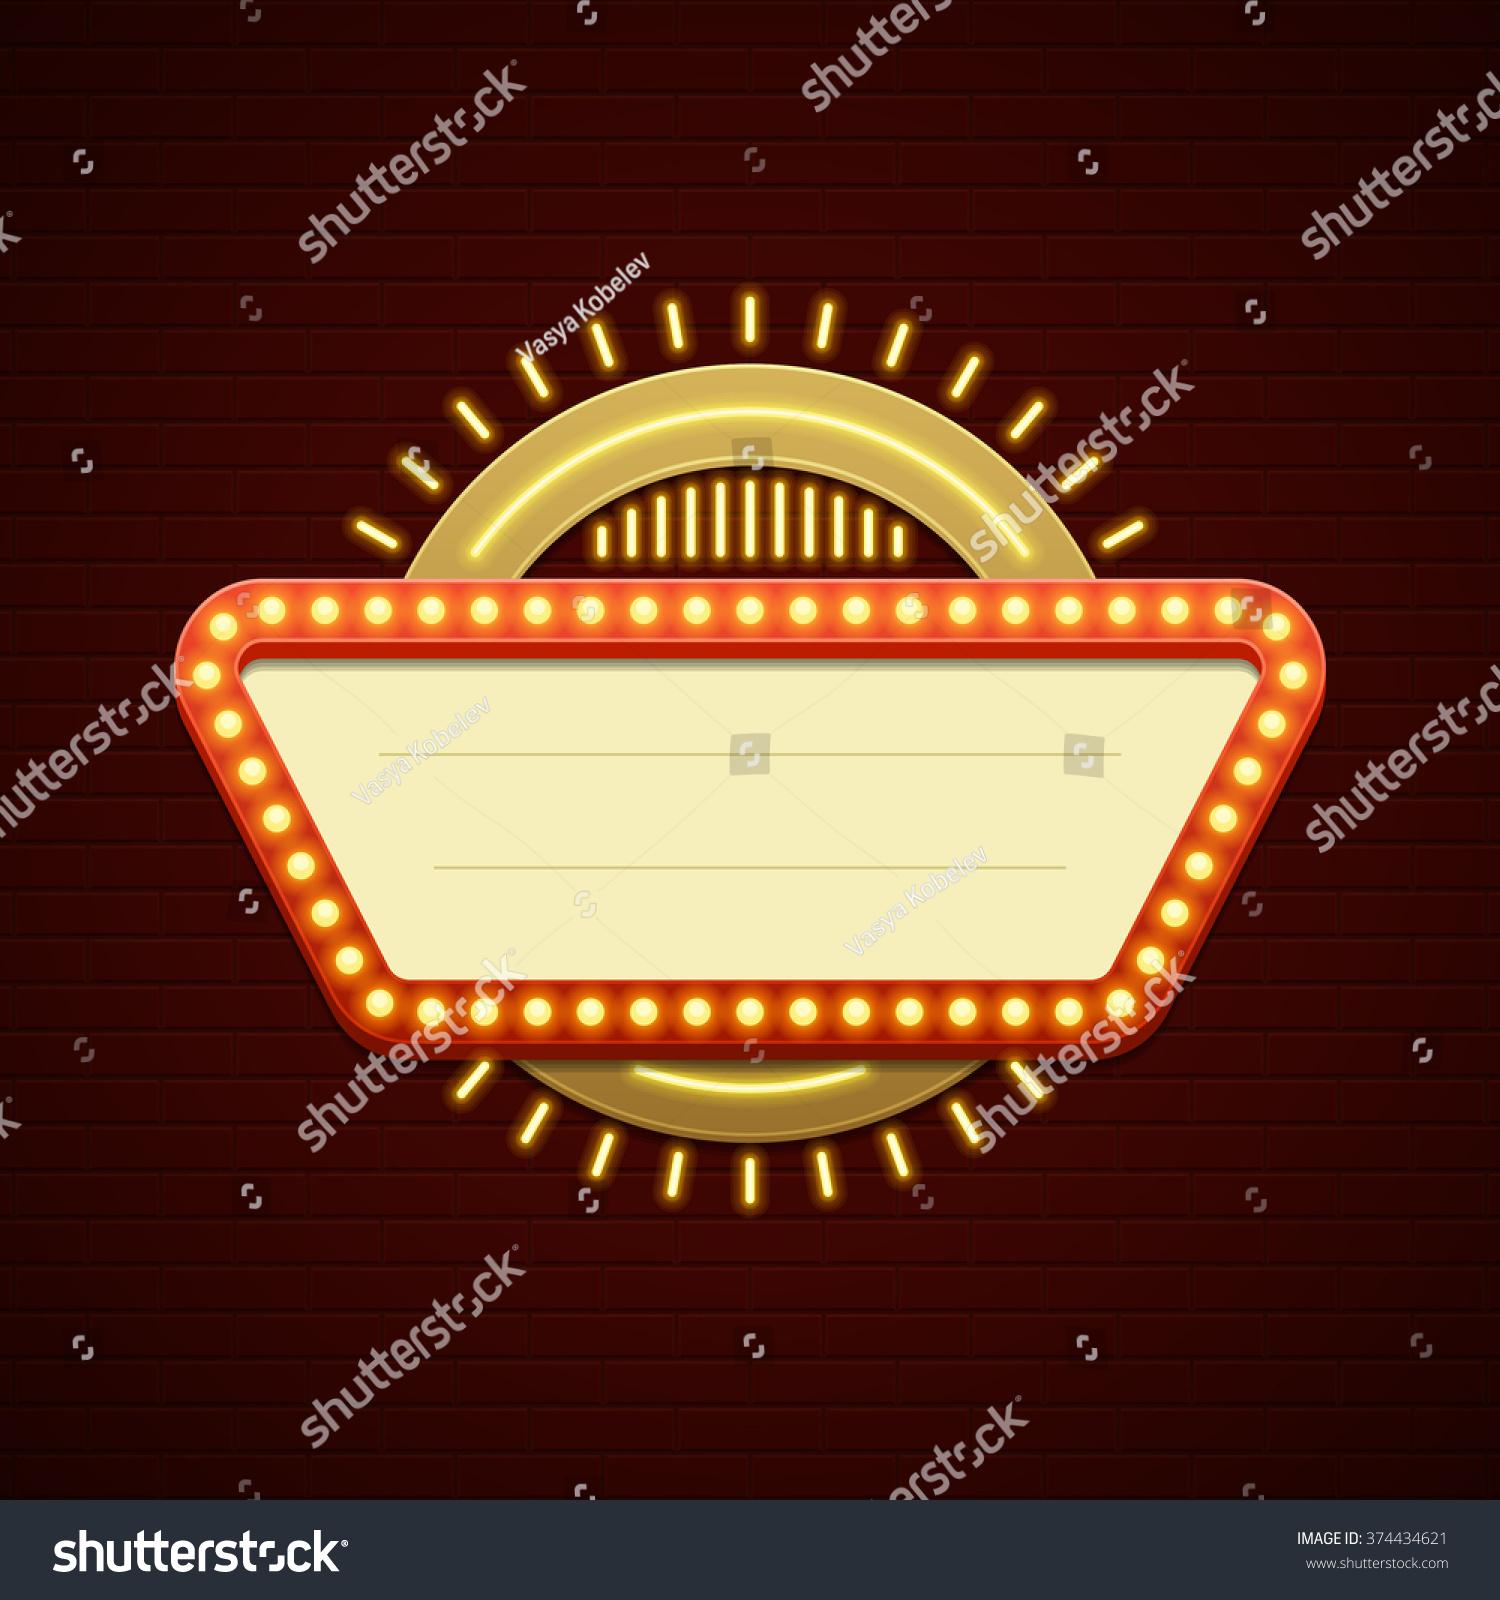 Retro Showtime Sign Design Cinema Signage Stock Vector